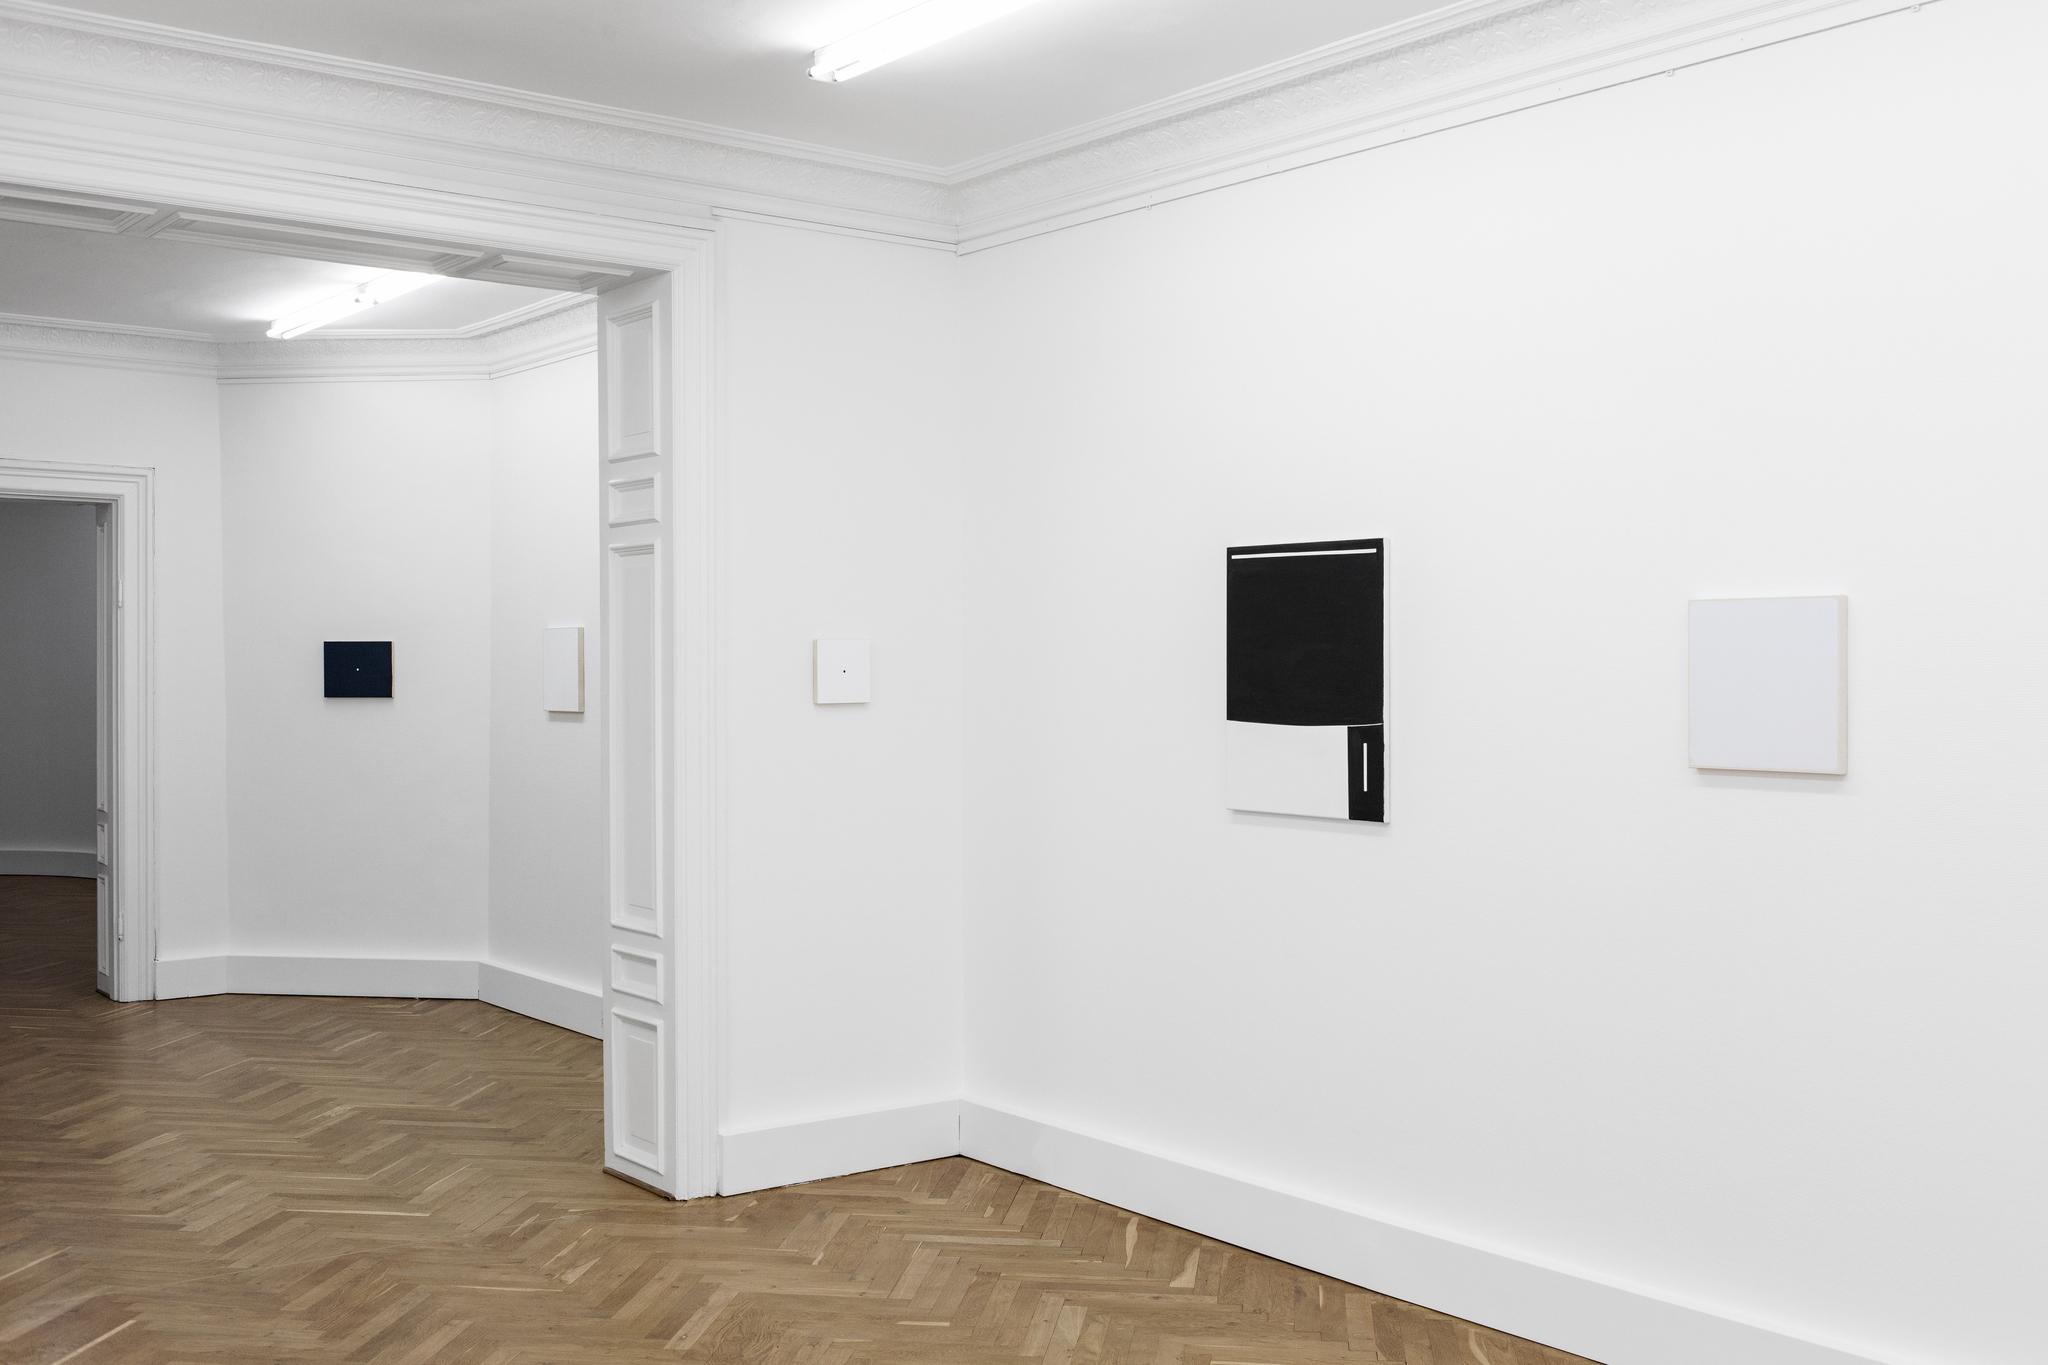 1-andre-butzer-matthew-feyld-daniel-levine-sundays-gallery